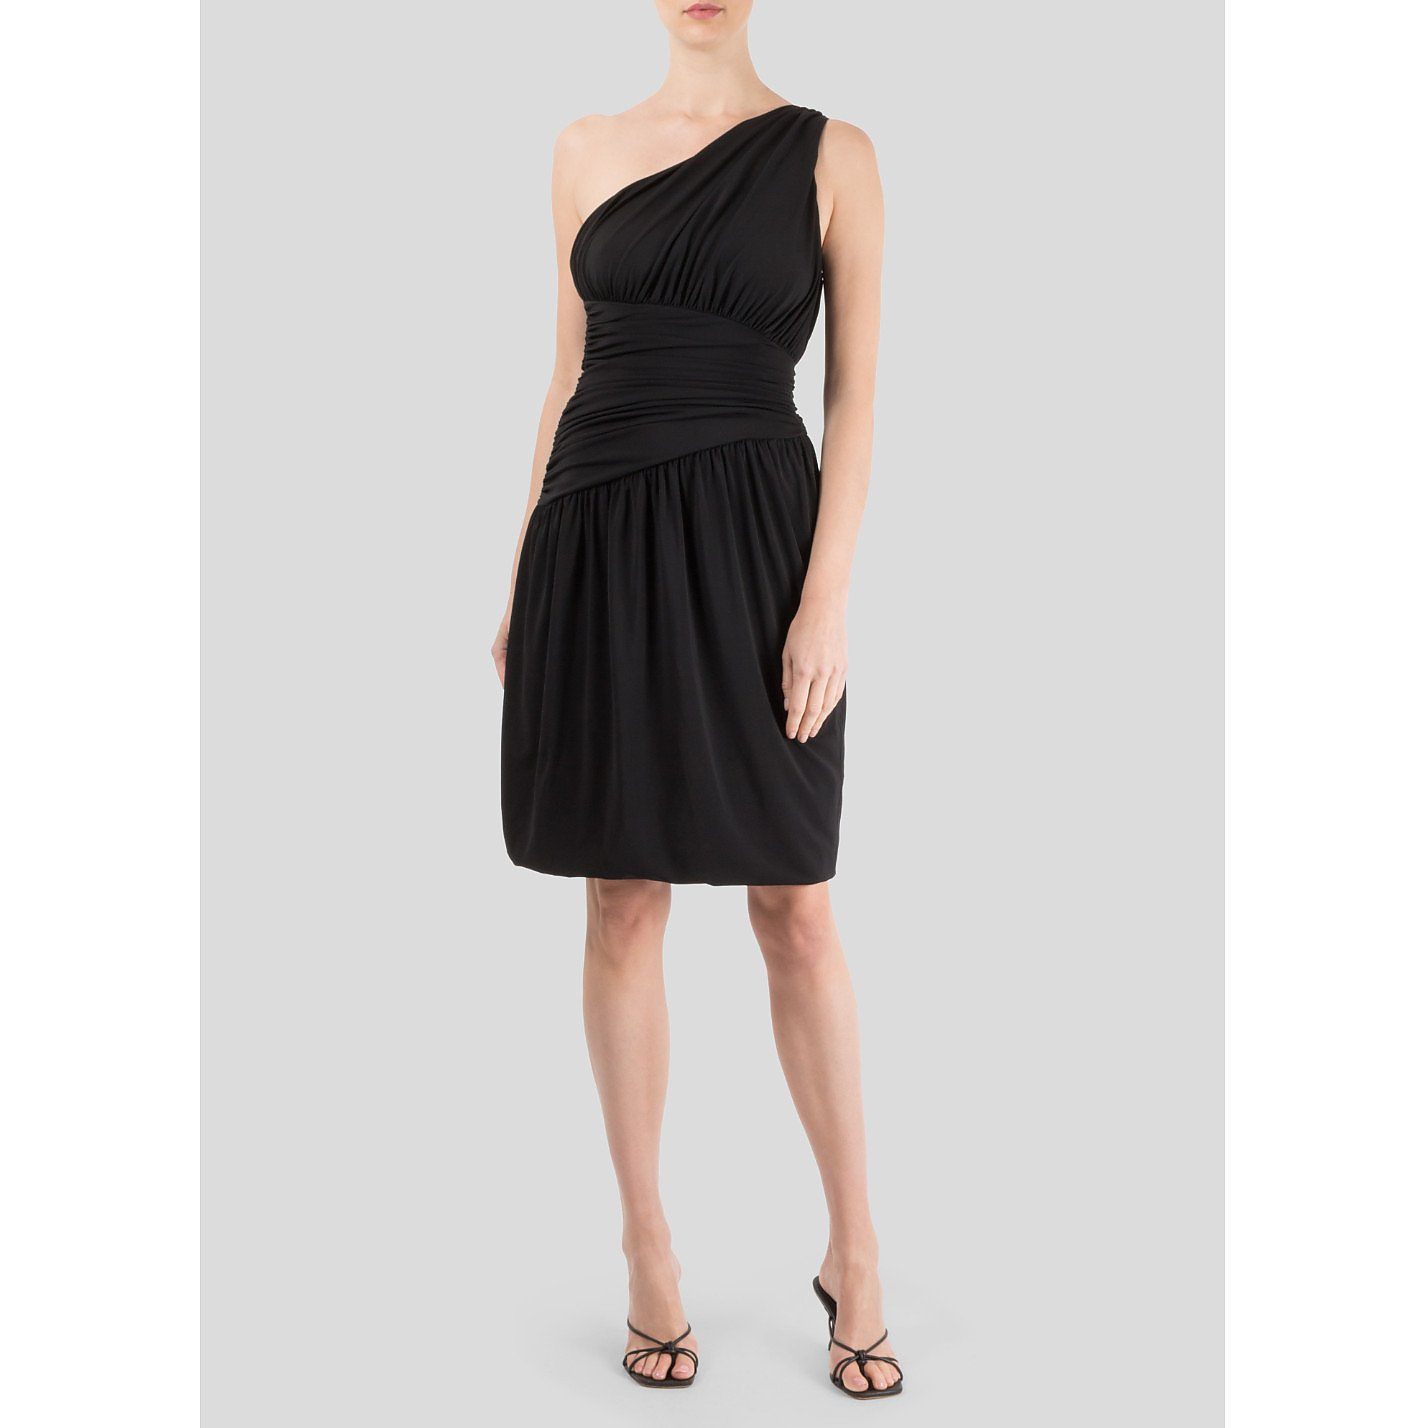 Vera Wang One Shoulder Mini Dress